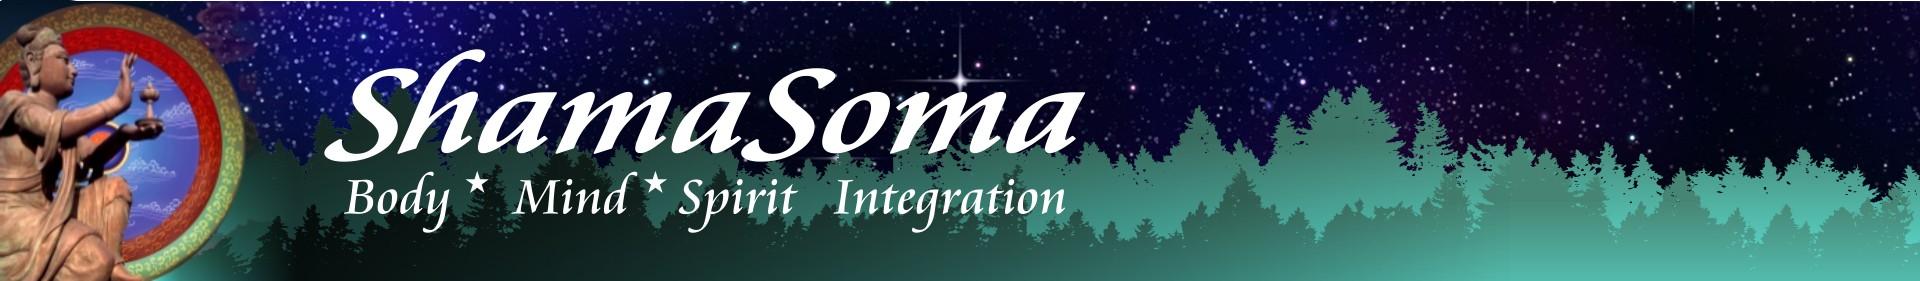 shamasoma-banner-2015-buddha